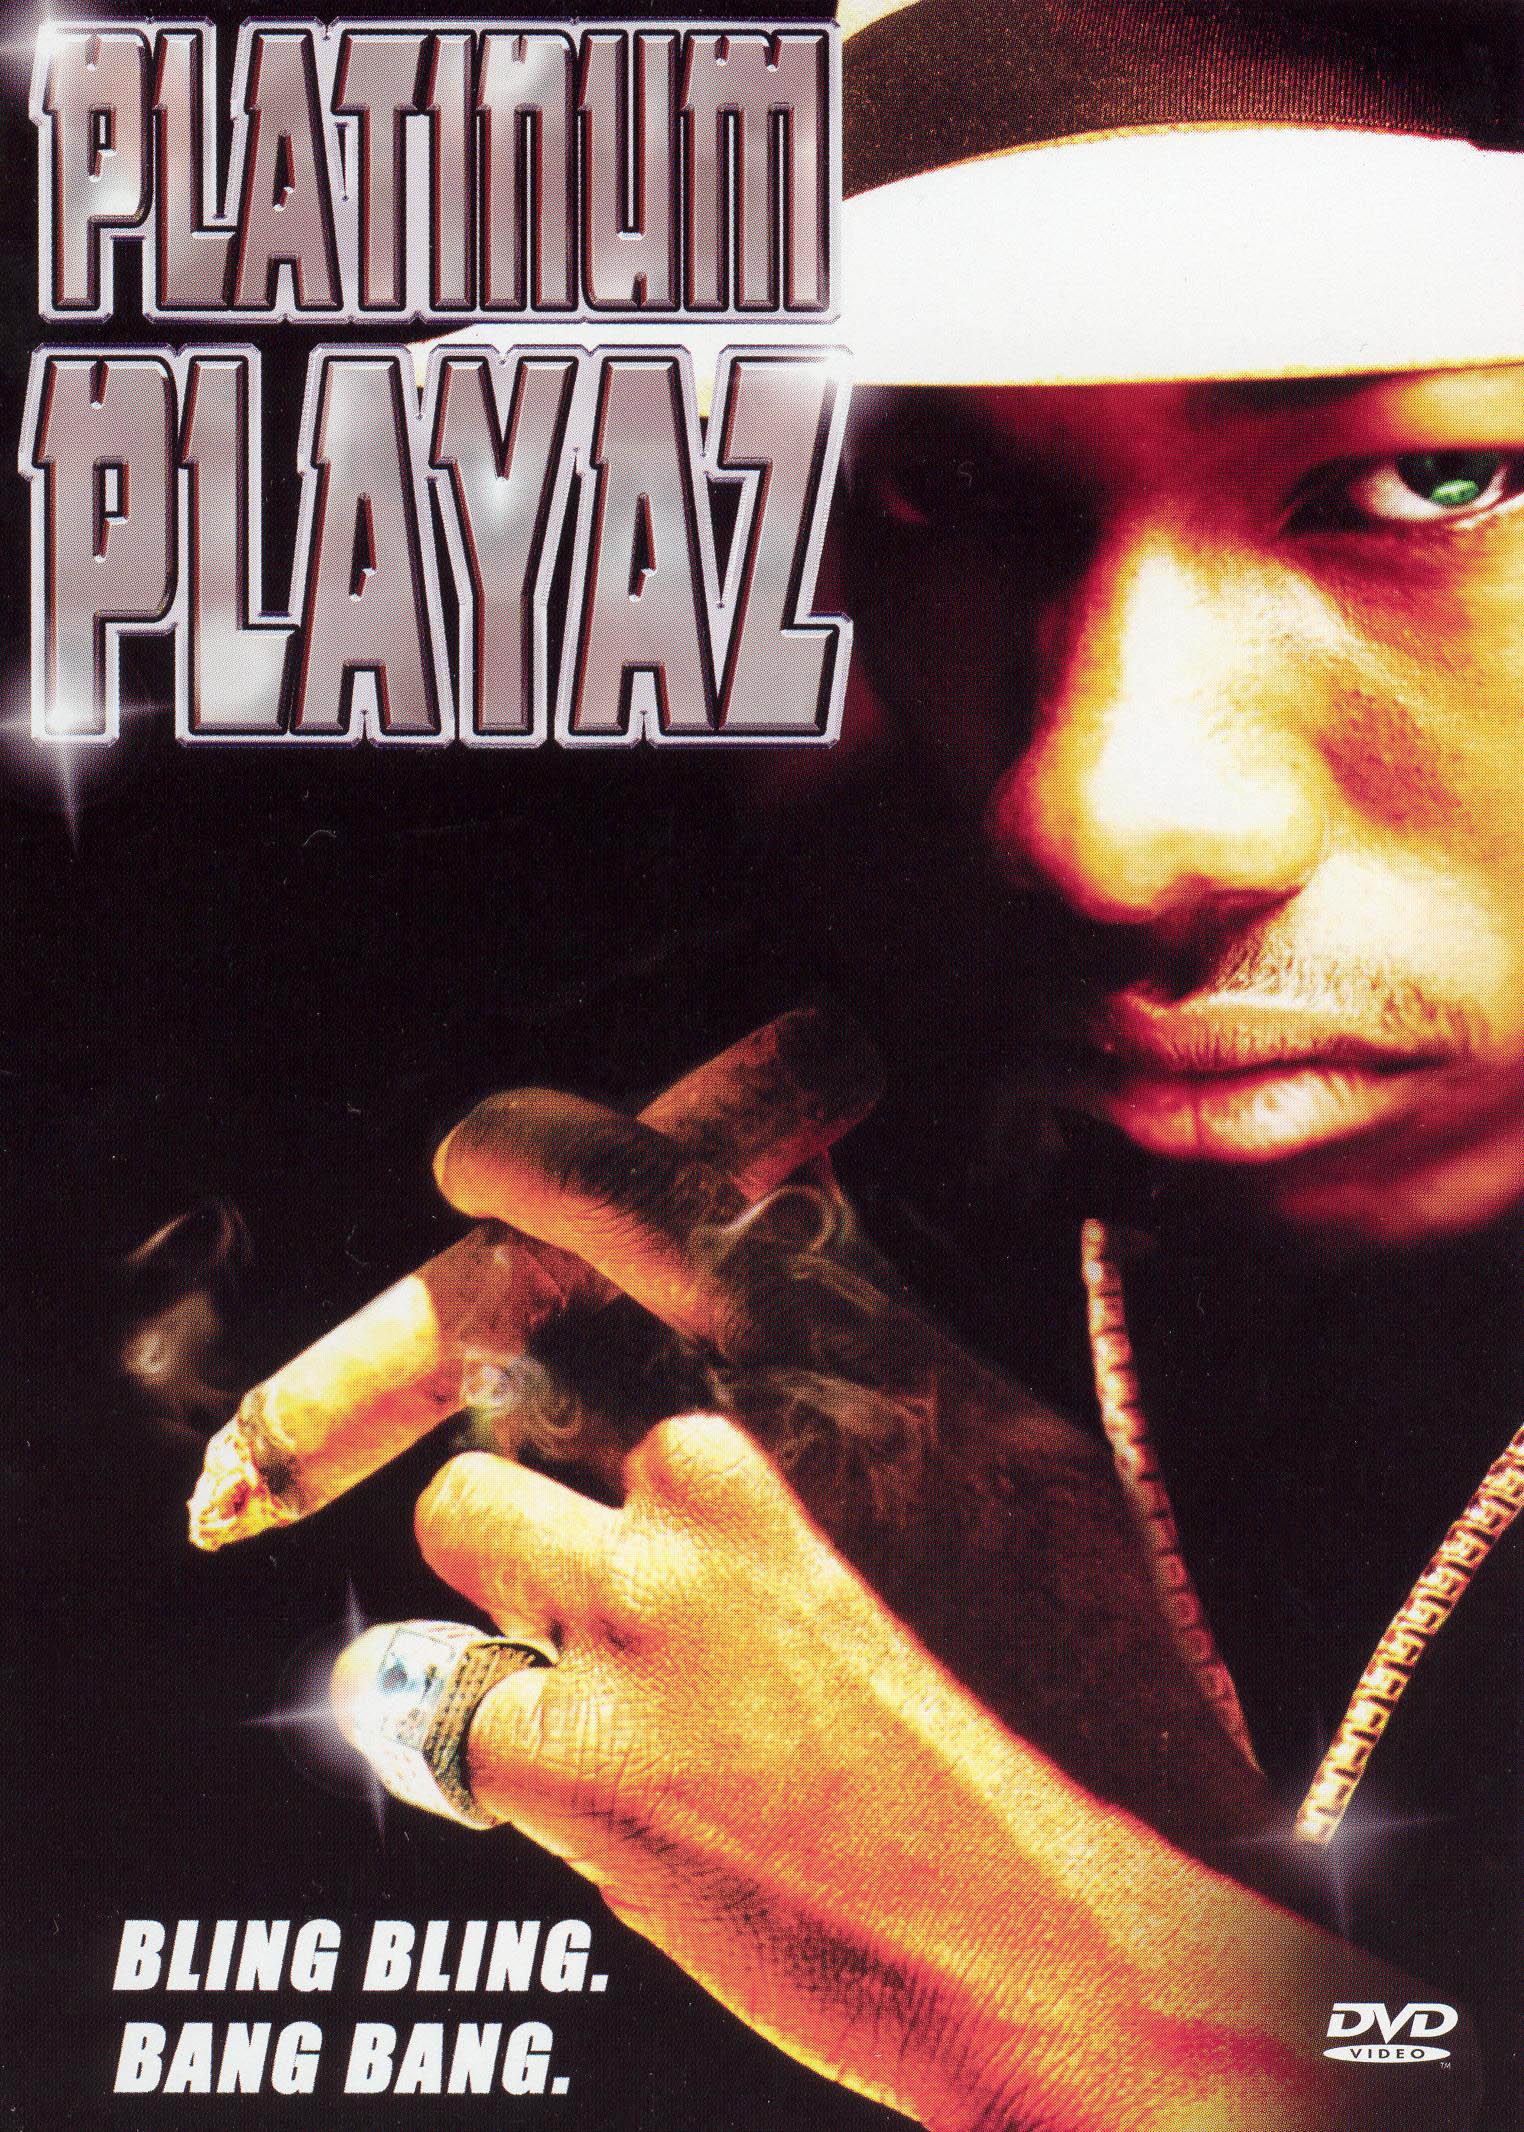 Platinum Playaz